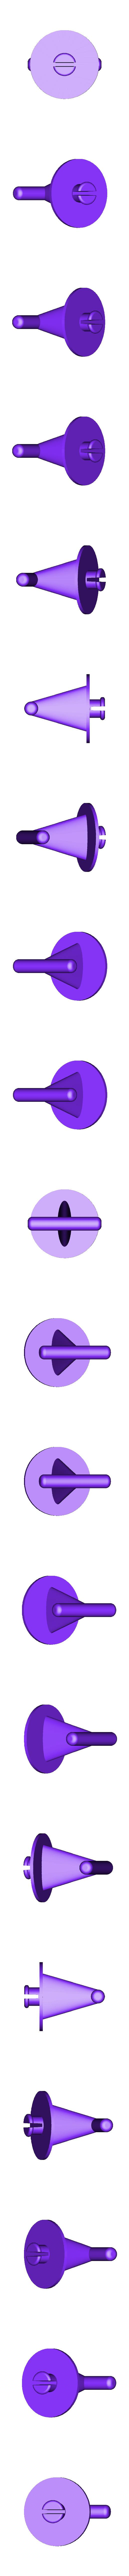 Link.stl Download free STL file Filament Spool Cufflinks • 3D printable object, Stot